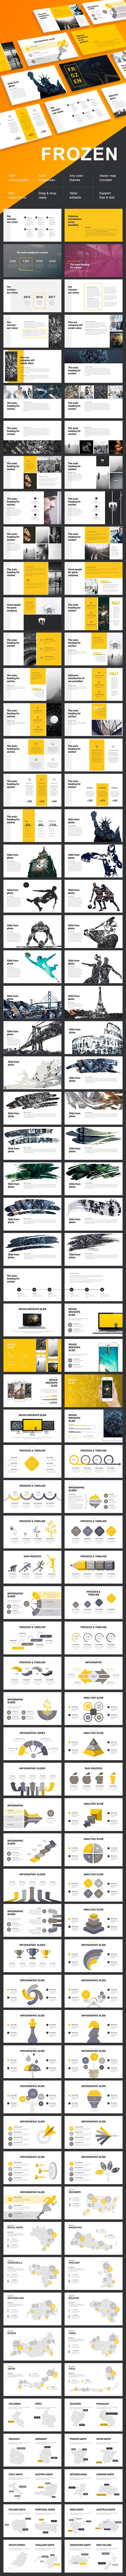 Frozen Video Powerpoint Template - Business PowerPoint Templates